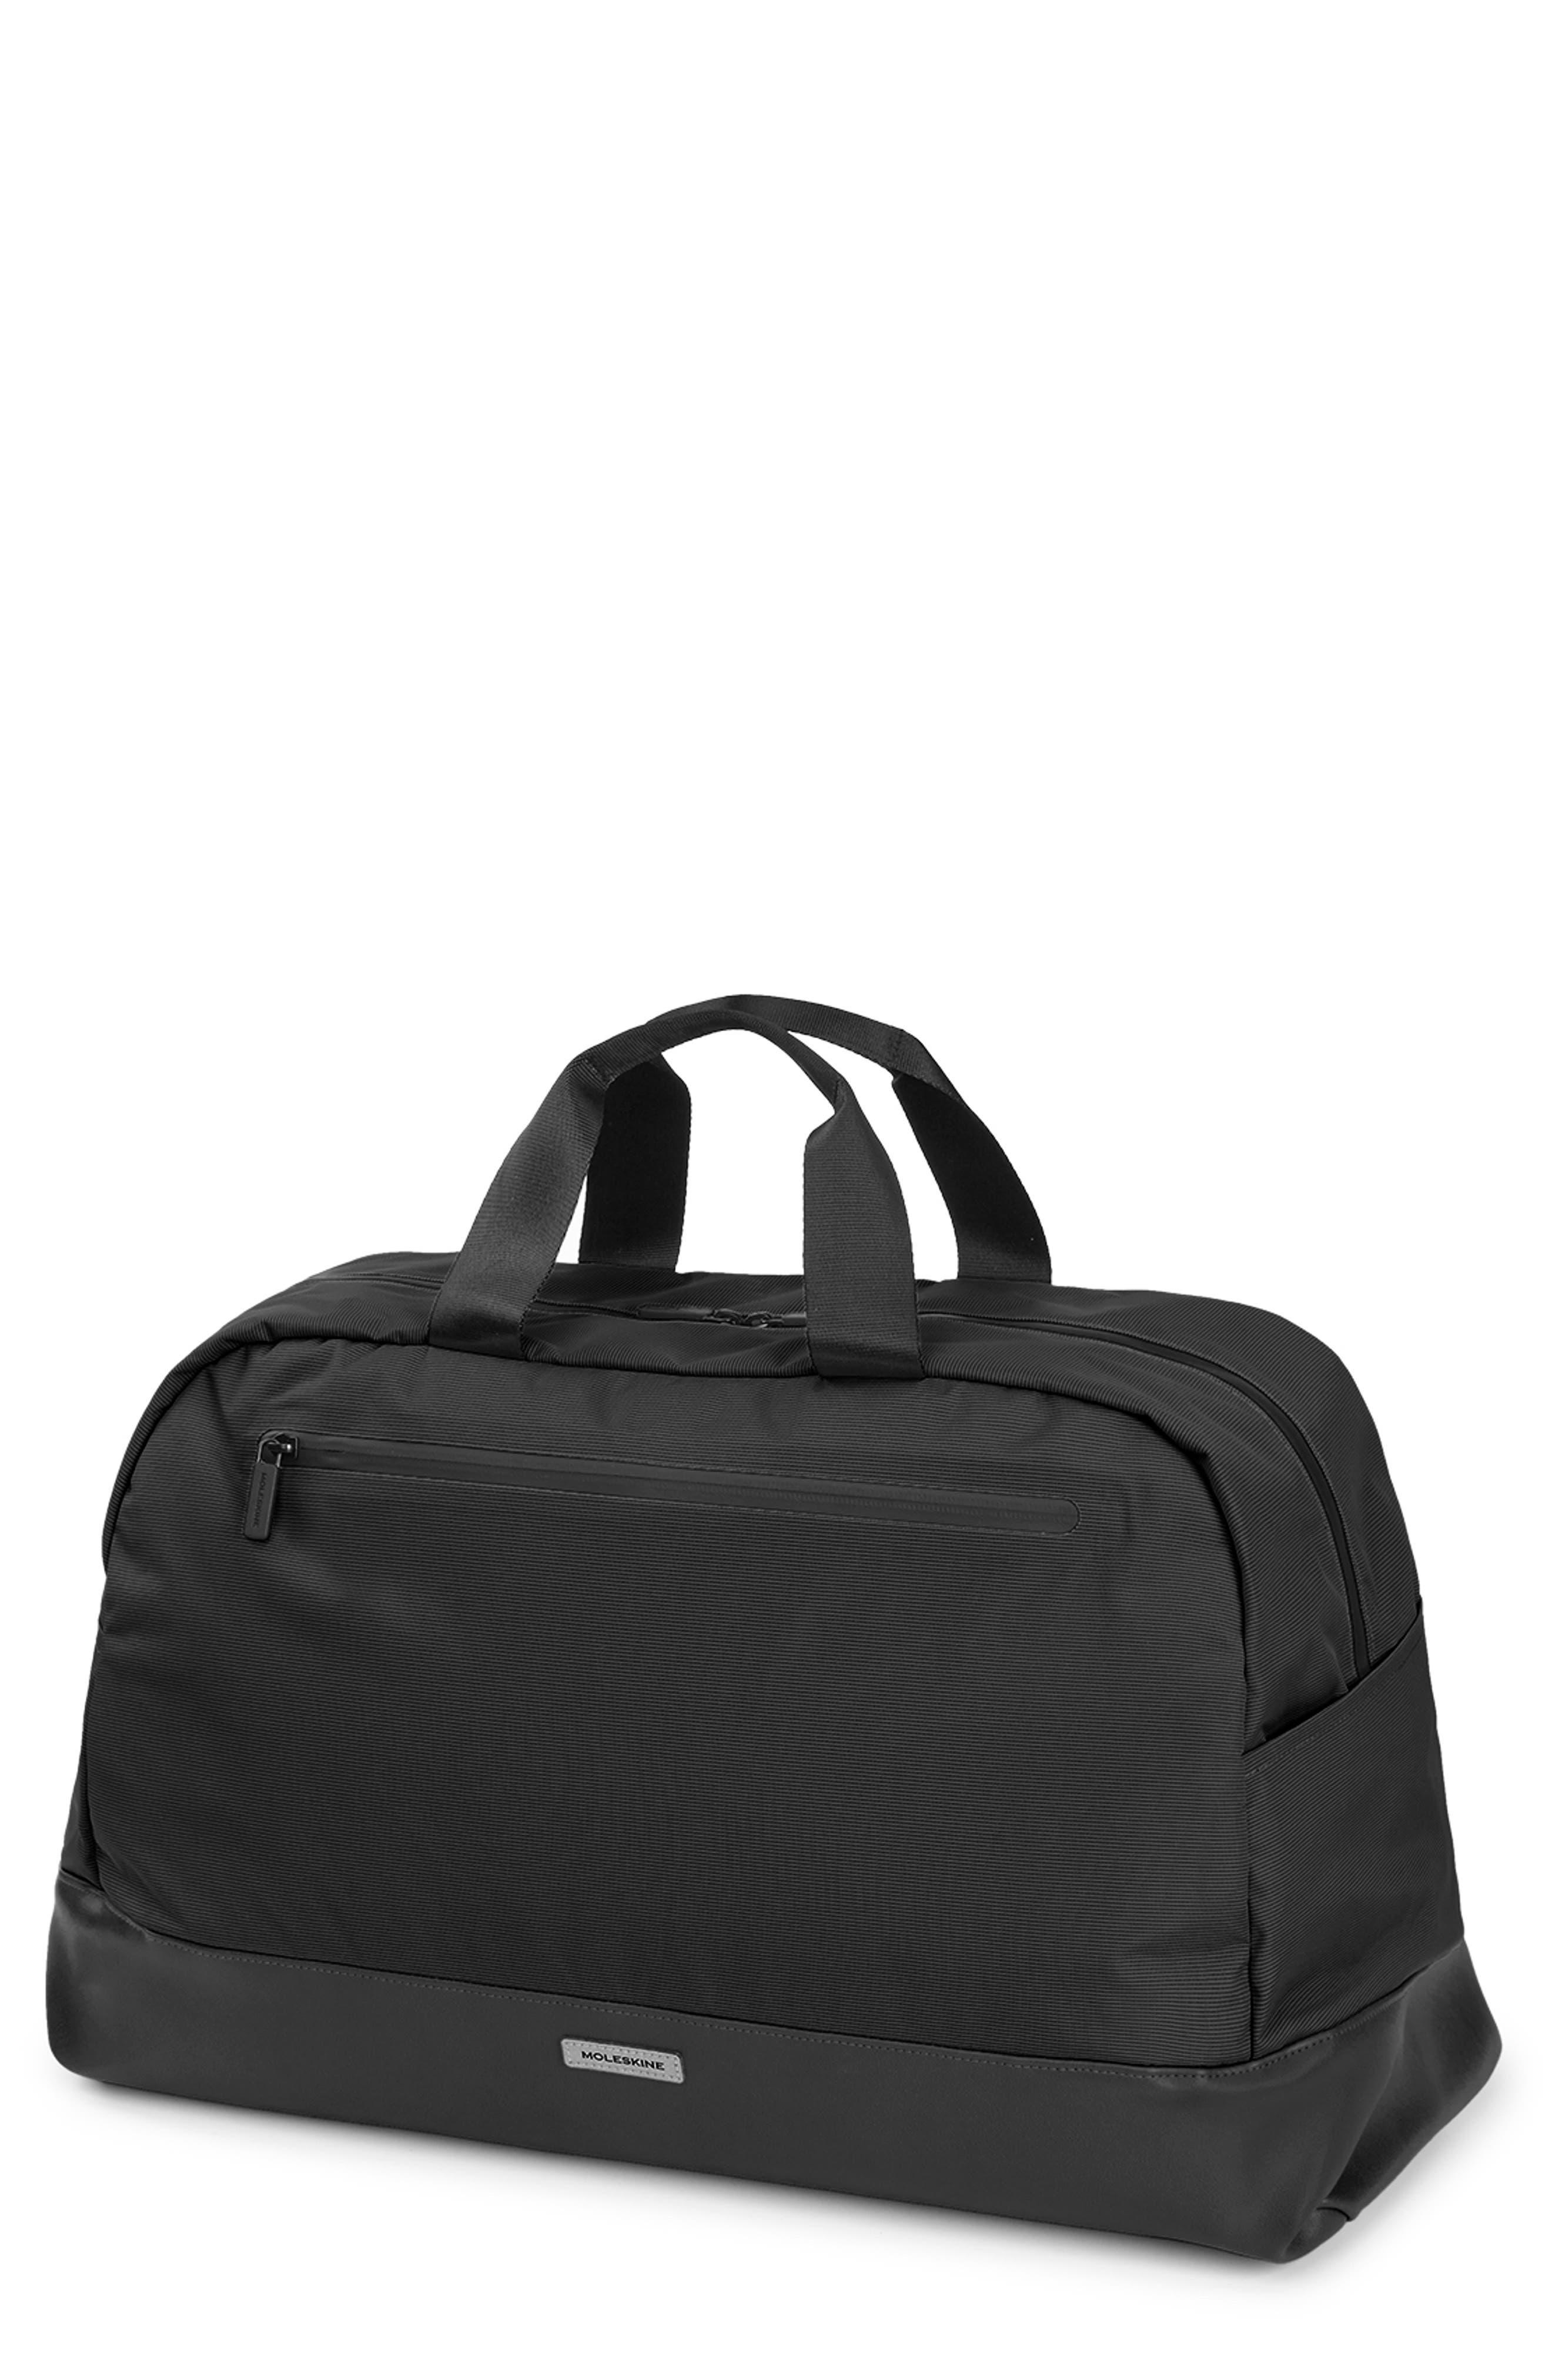 MOLESKINE, Moleskin Metro Duffle Bag, Main thumbnail 1, color, BLACK